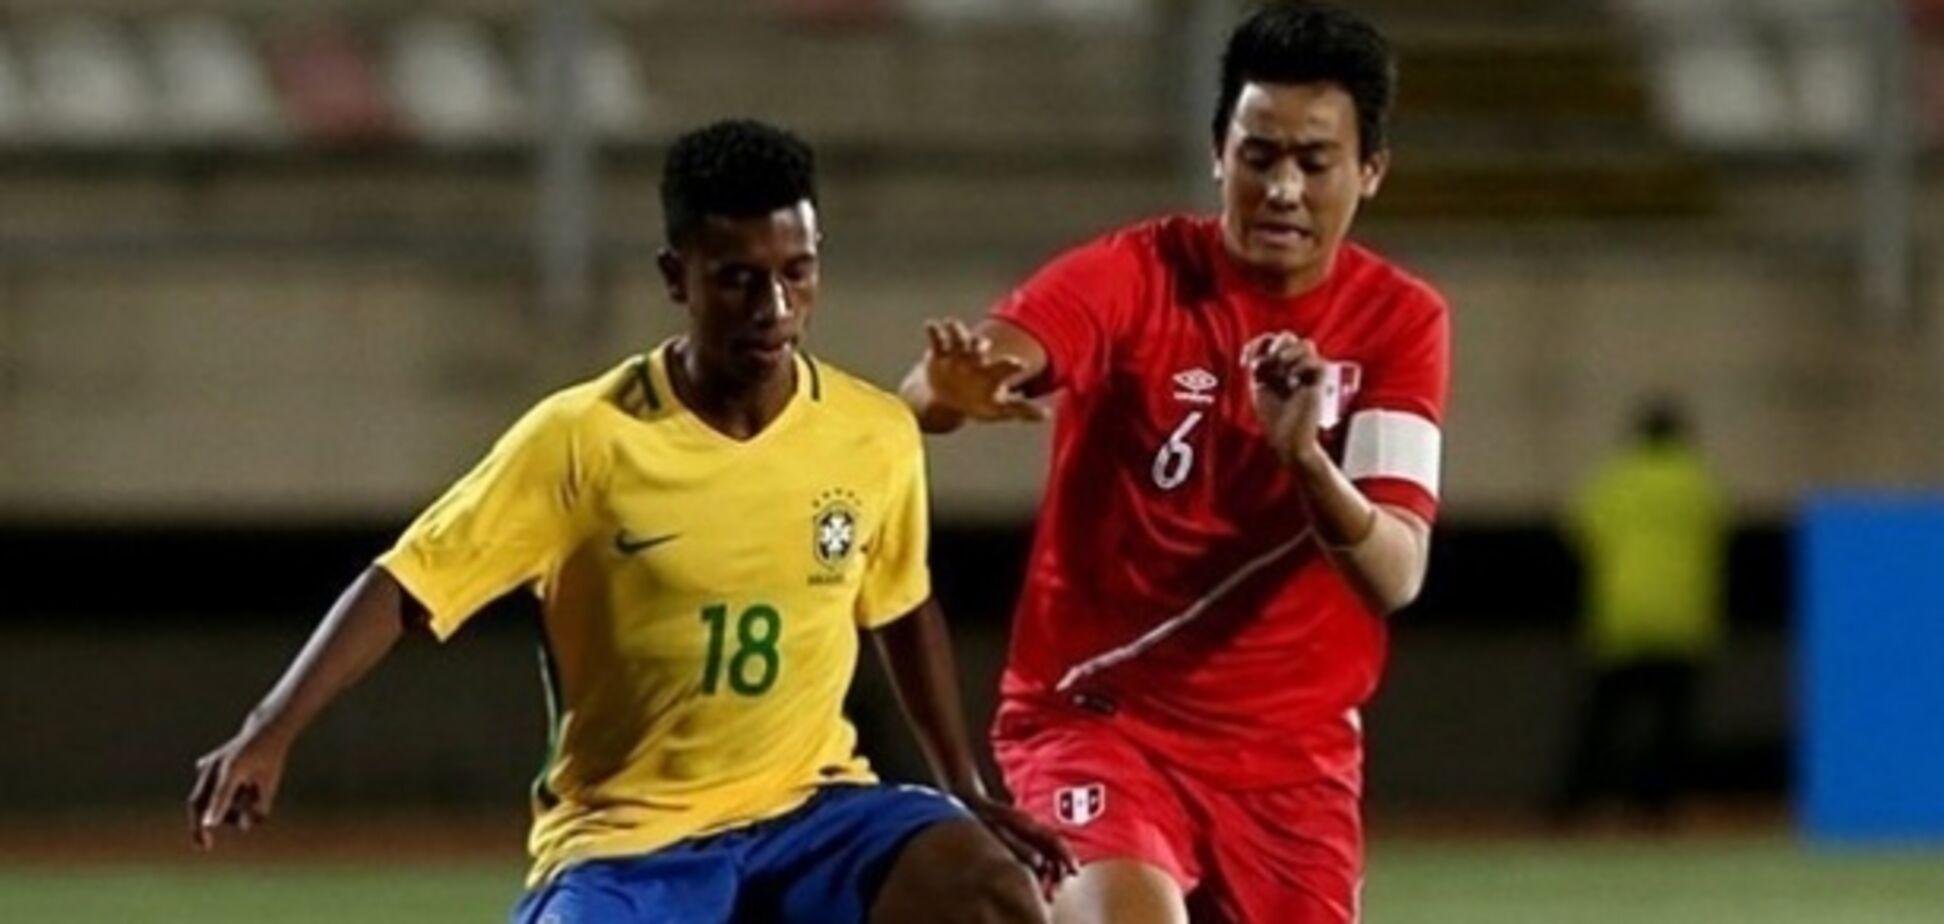 'Шахтер' подписал бразильского таланта - СМИ